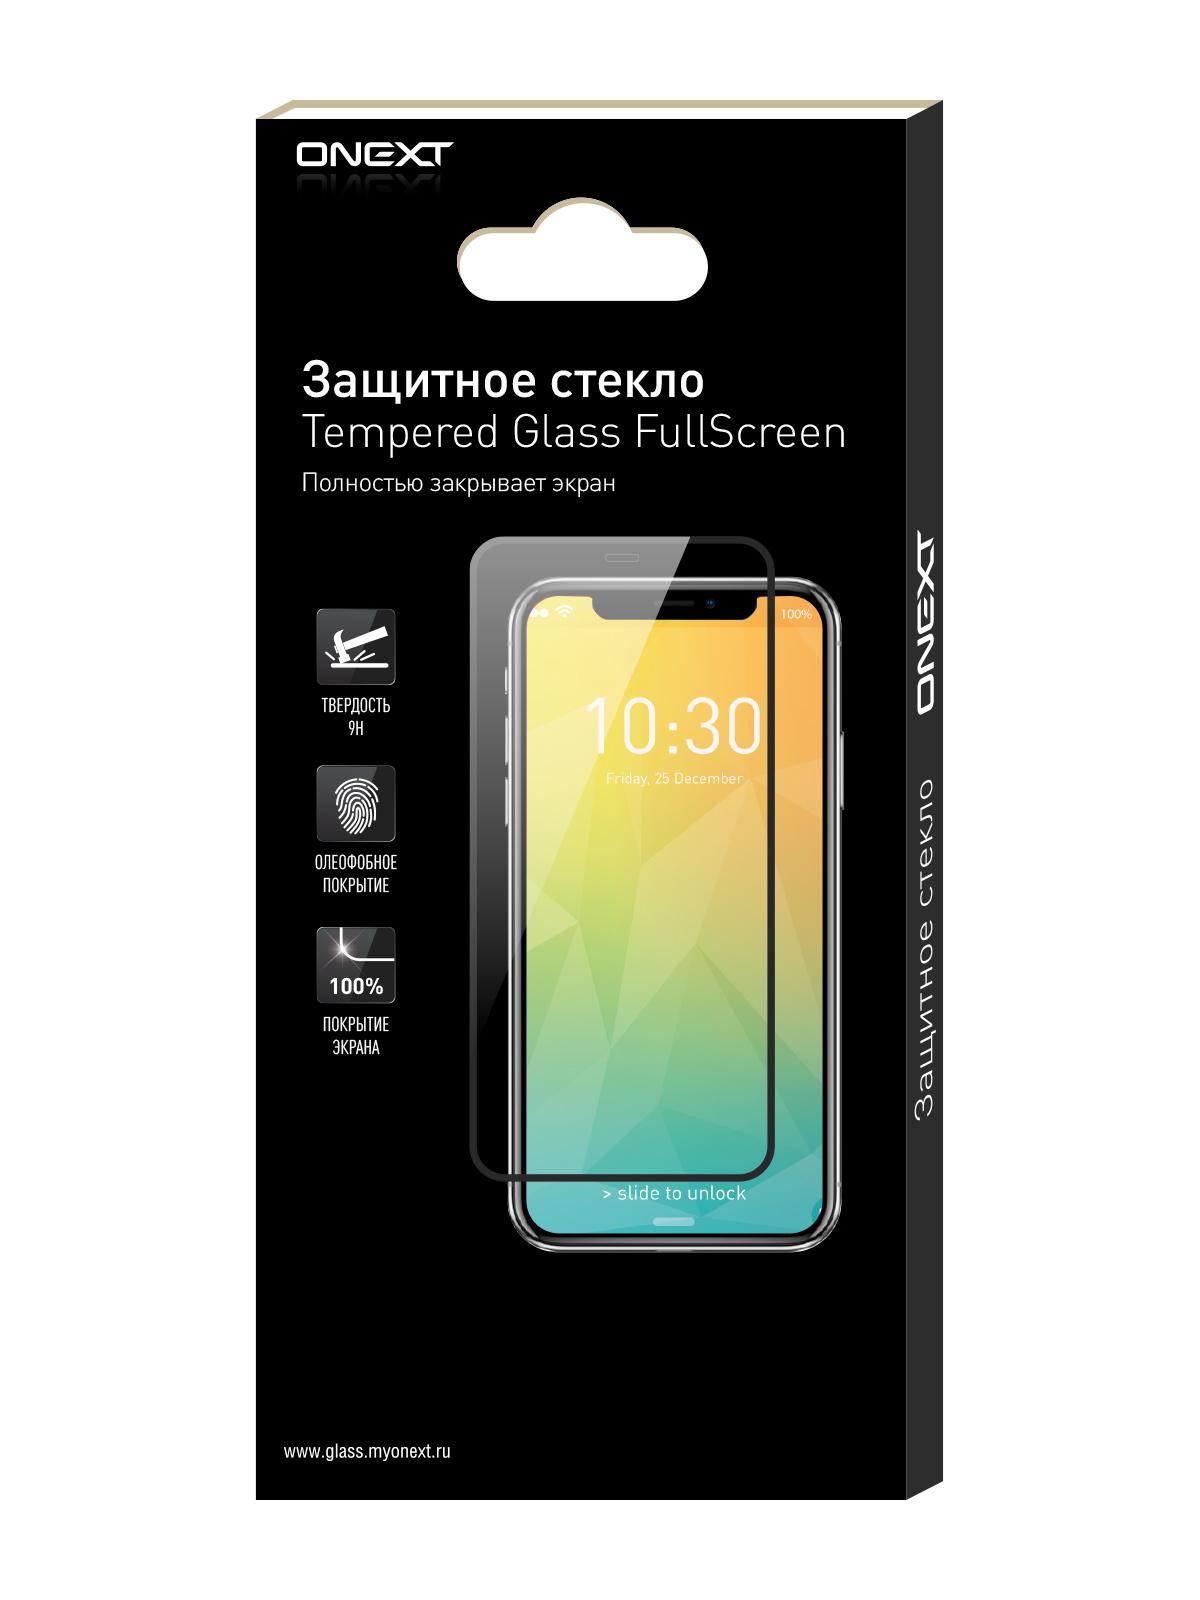 Защитное стекло ONEXT для Huawei P10 Lite Gold